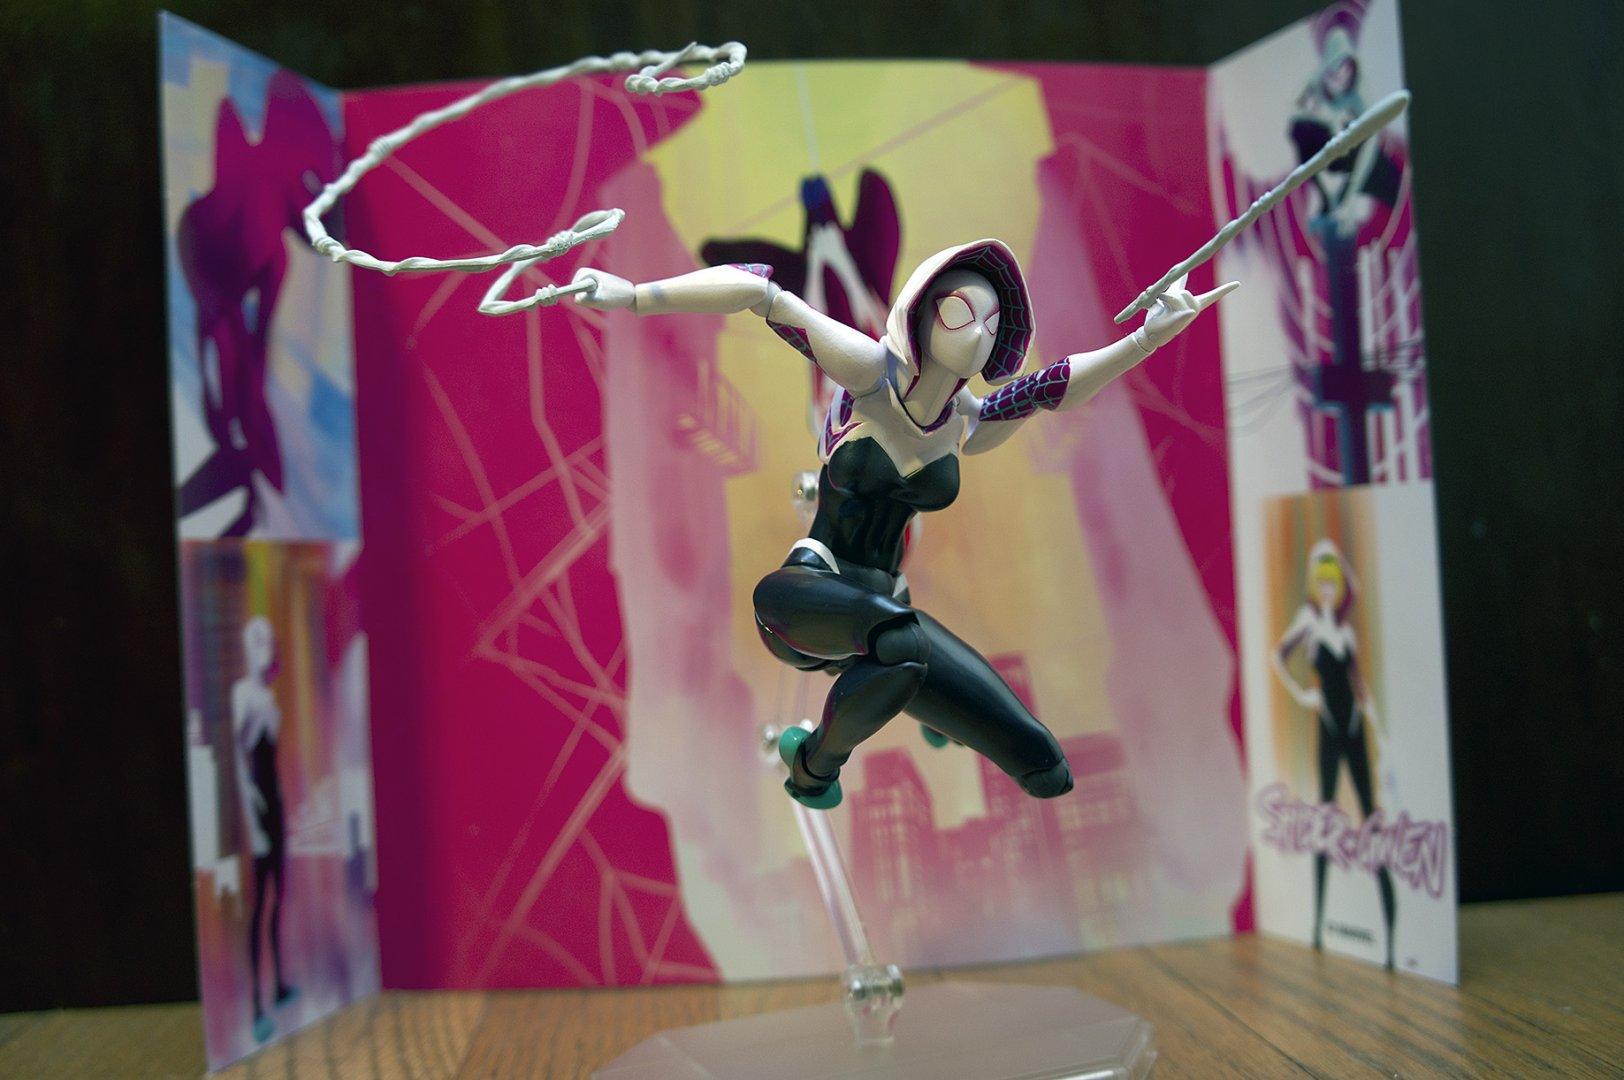 Marvel_Revo_Spider-Gwen_DSC06099.thumb.jpg.150f439df79f64ee4b83eef983543032.jpg